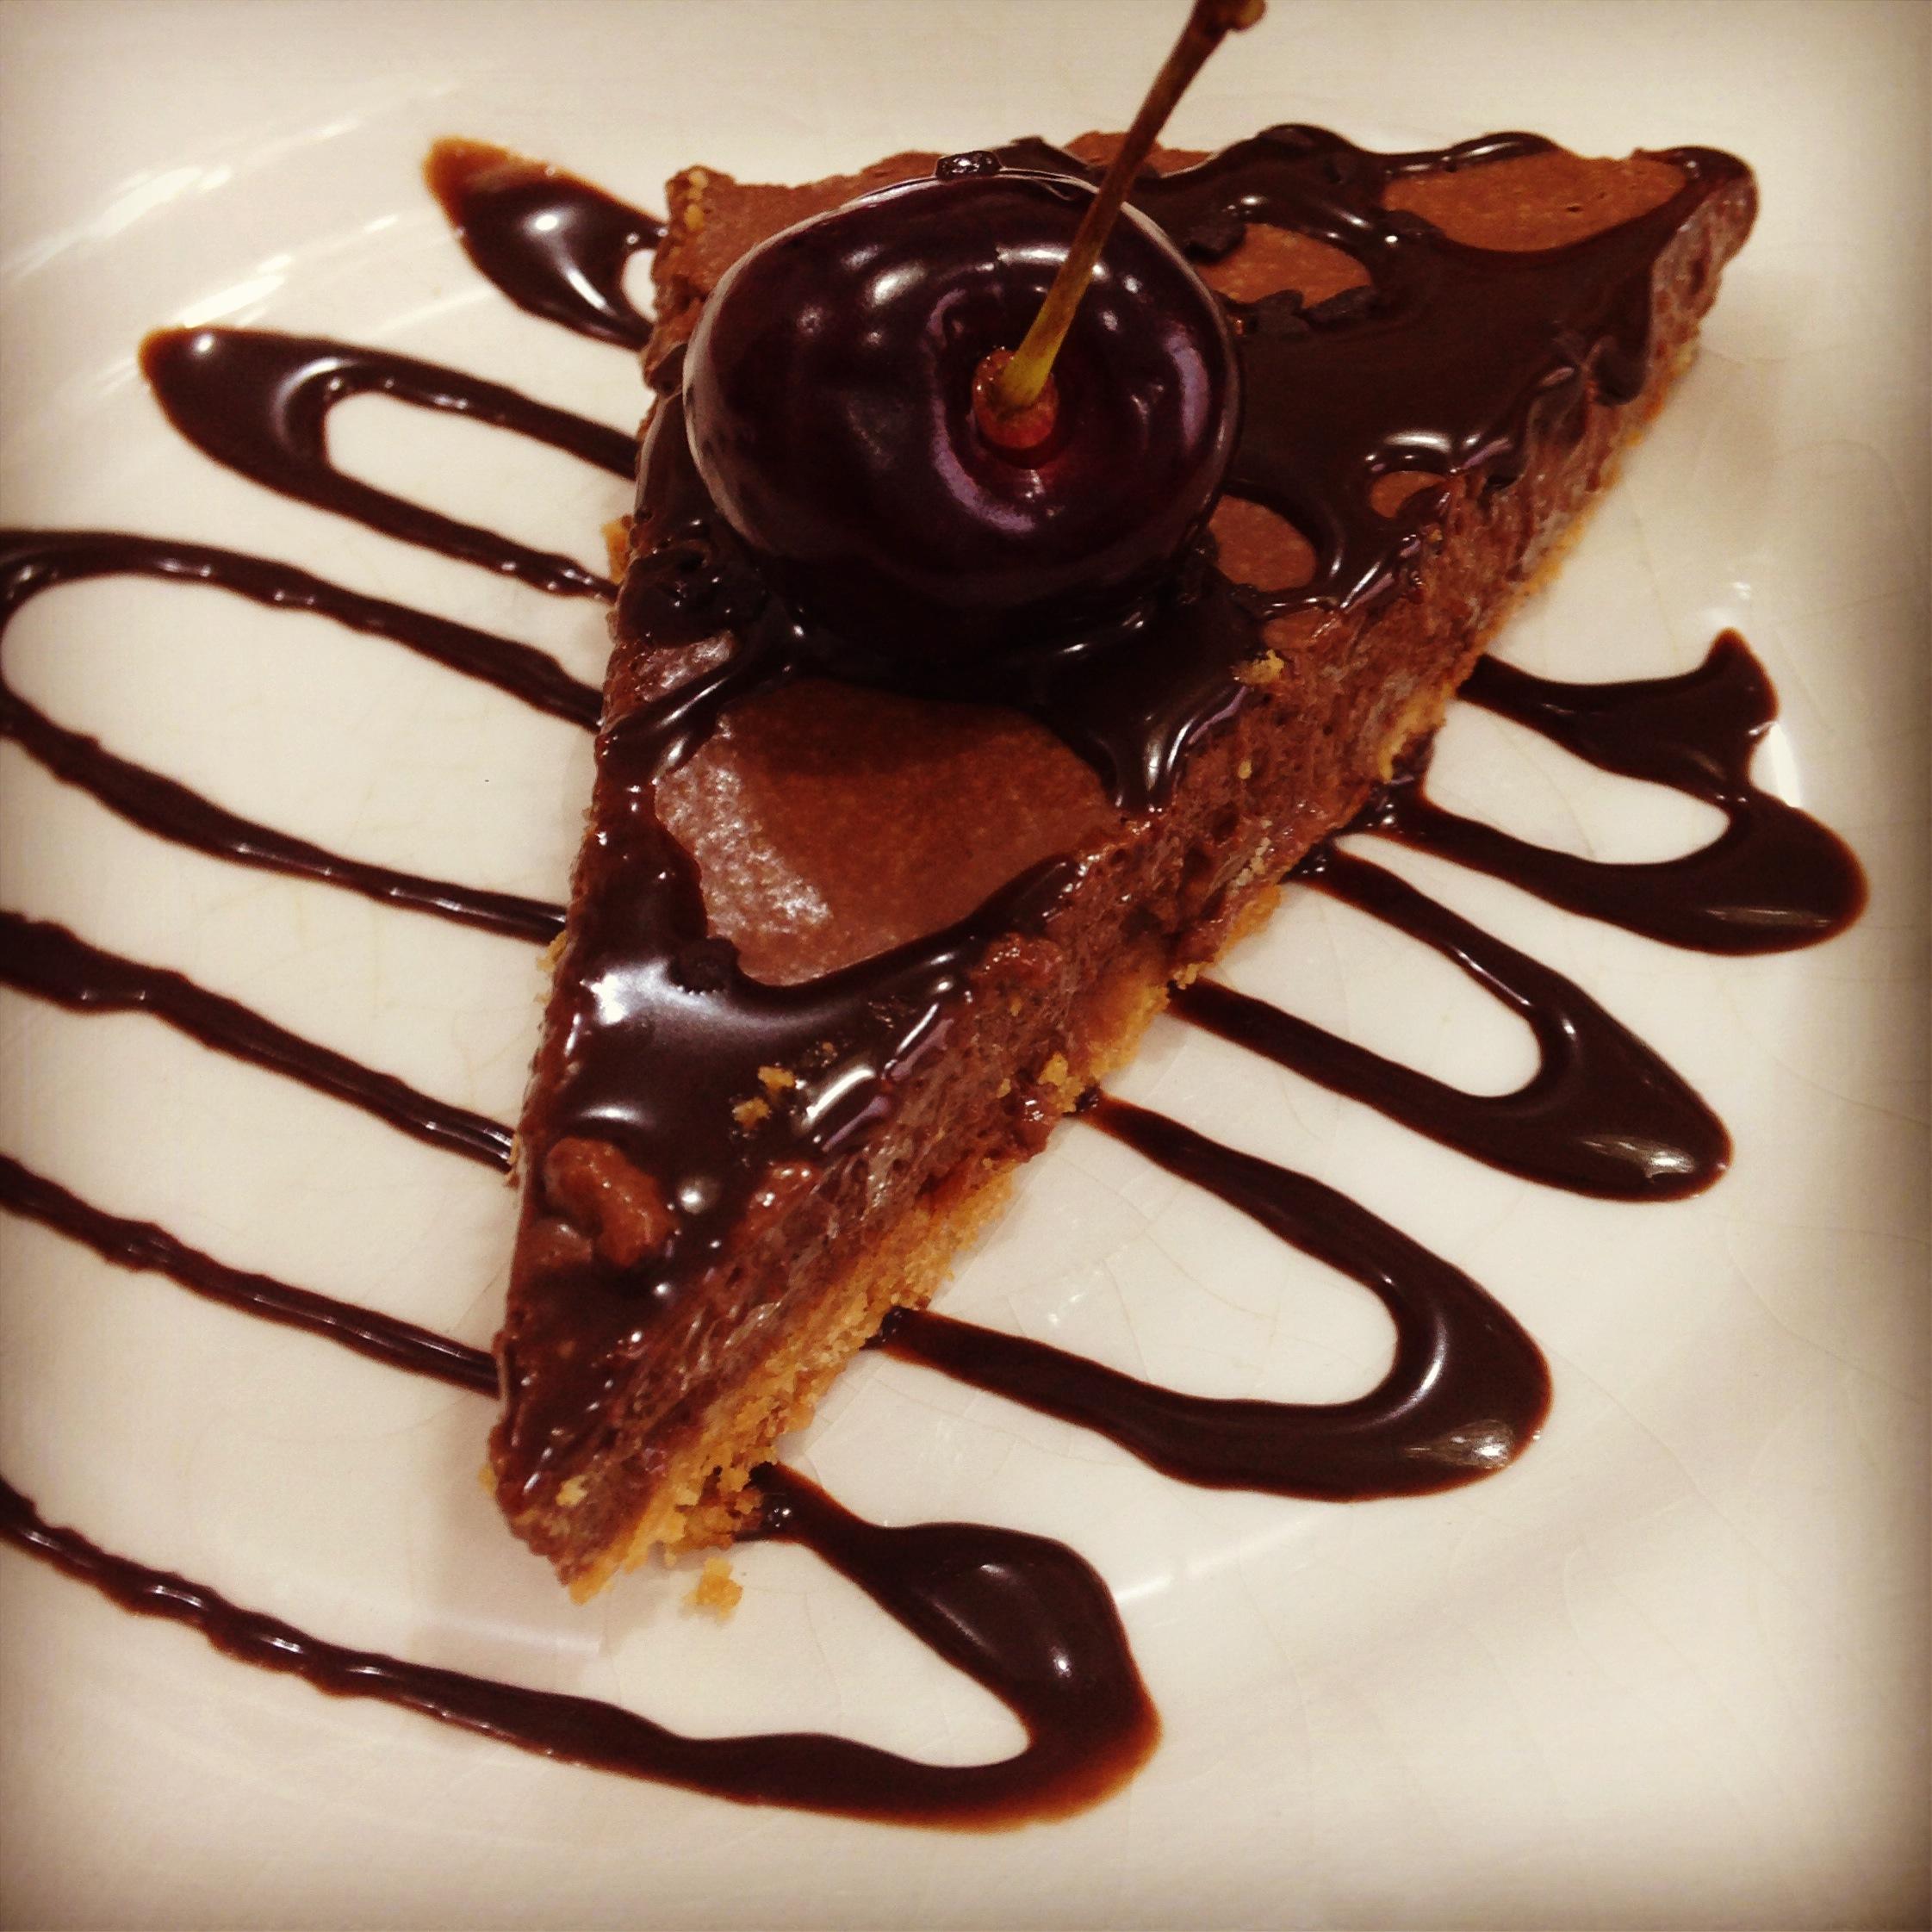 Torta Mousse de chocolate sem glúten e sem ovos